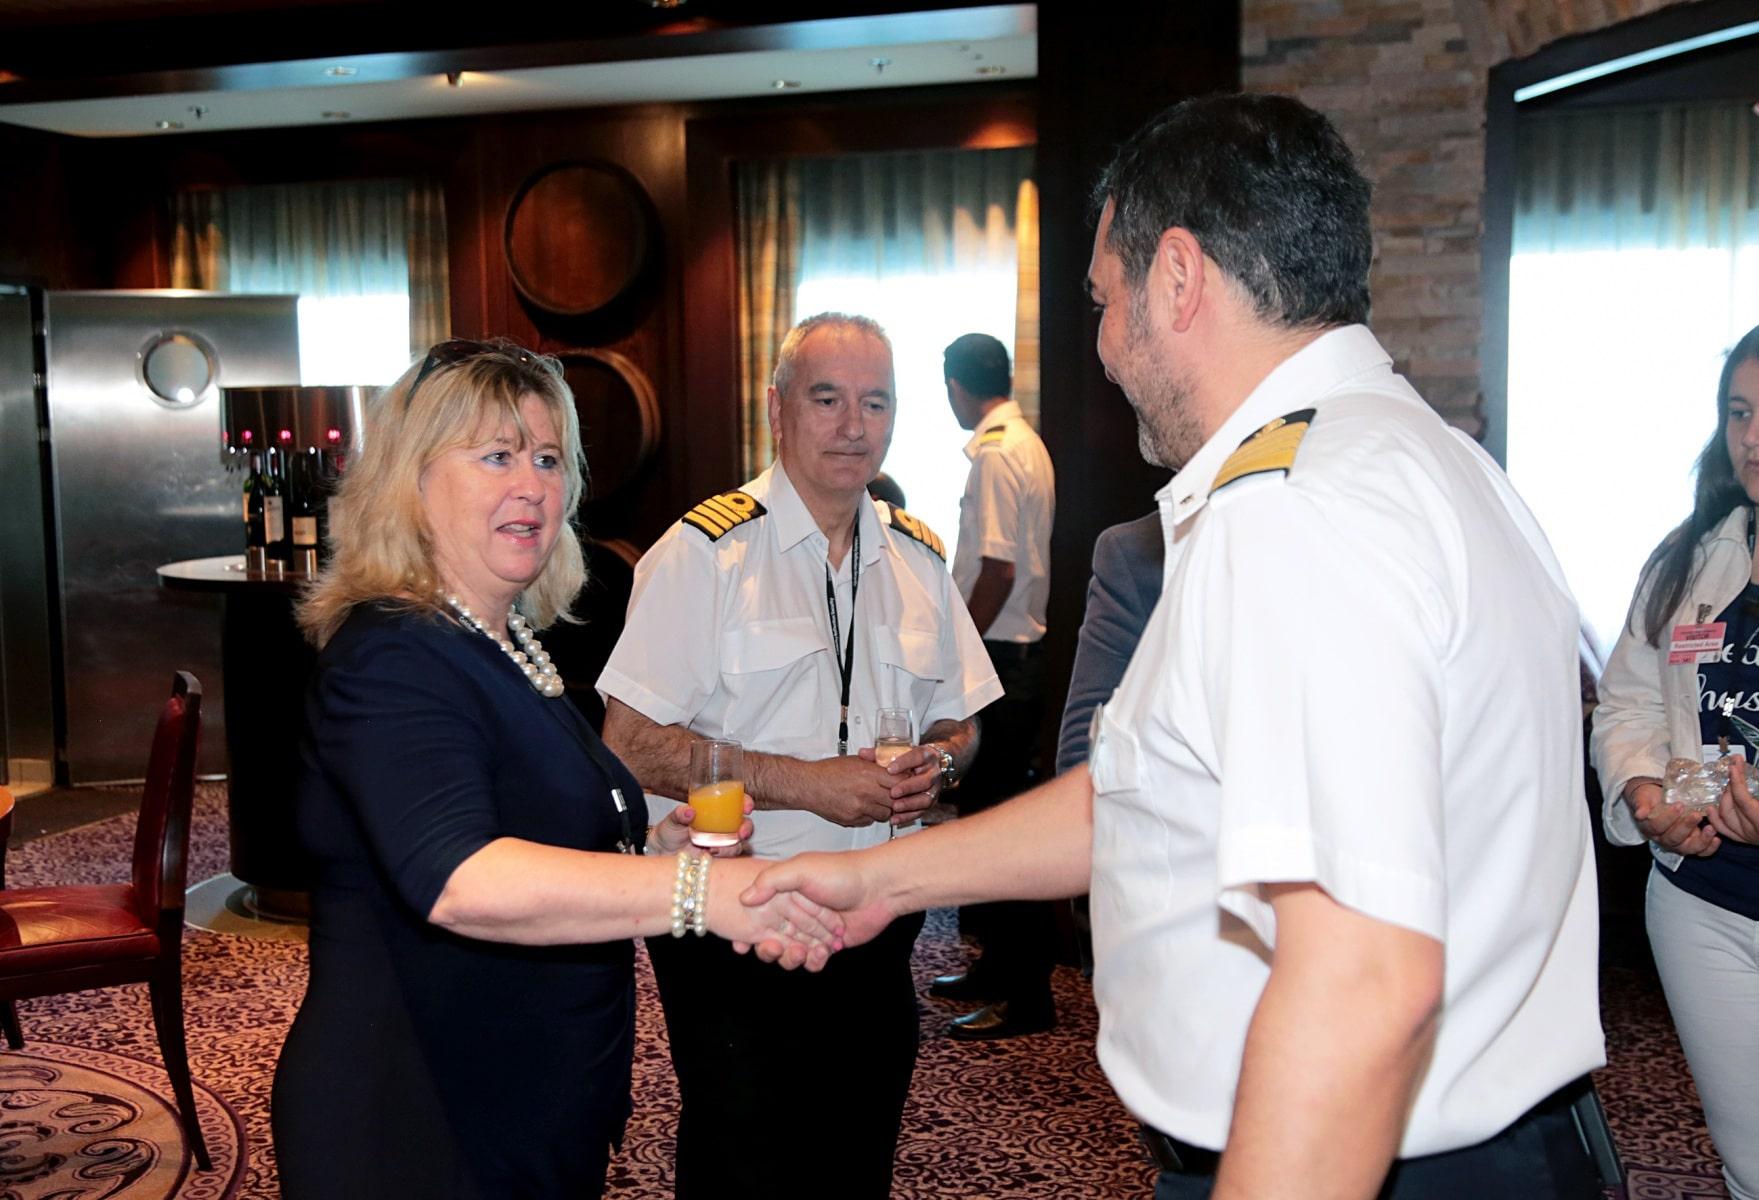 Escala-inaugural-del-crucero-Ovation-of-the-Seas-23